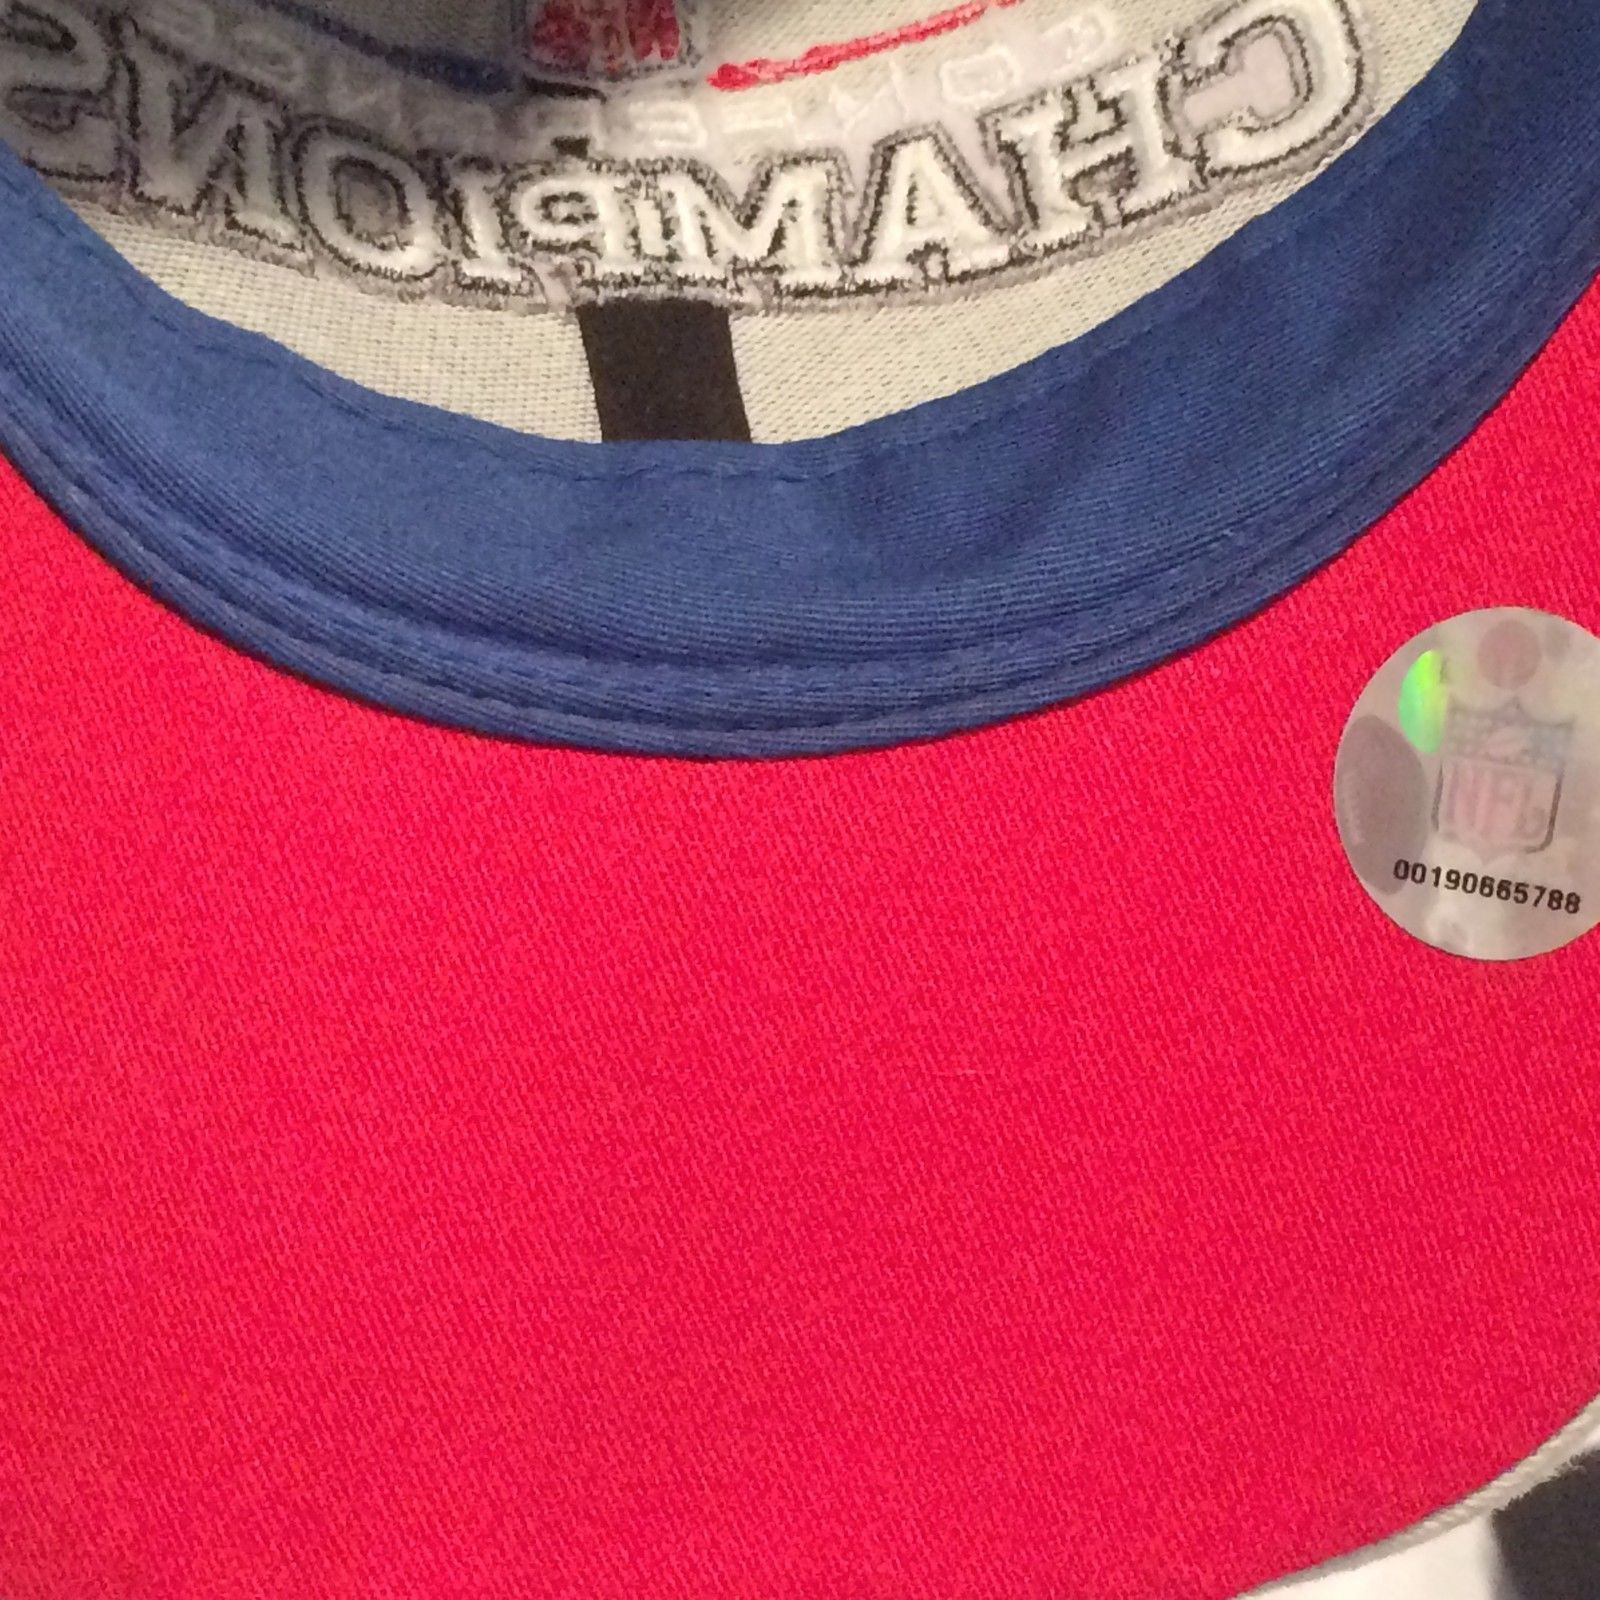 New England Patriots Reebok Conf Champions Super Bowl 42 Baseball Hat (17-3)